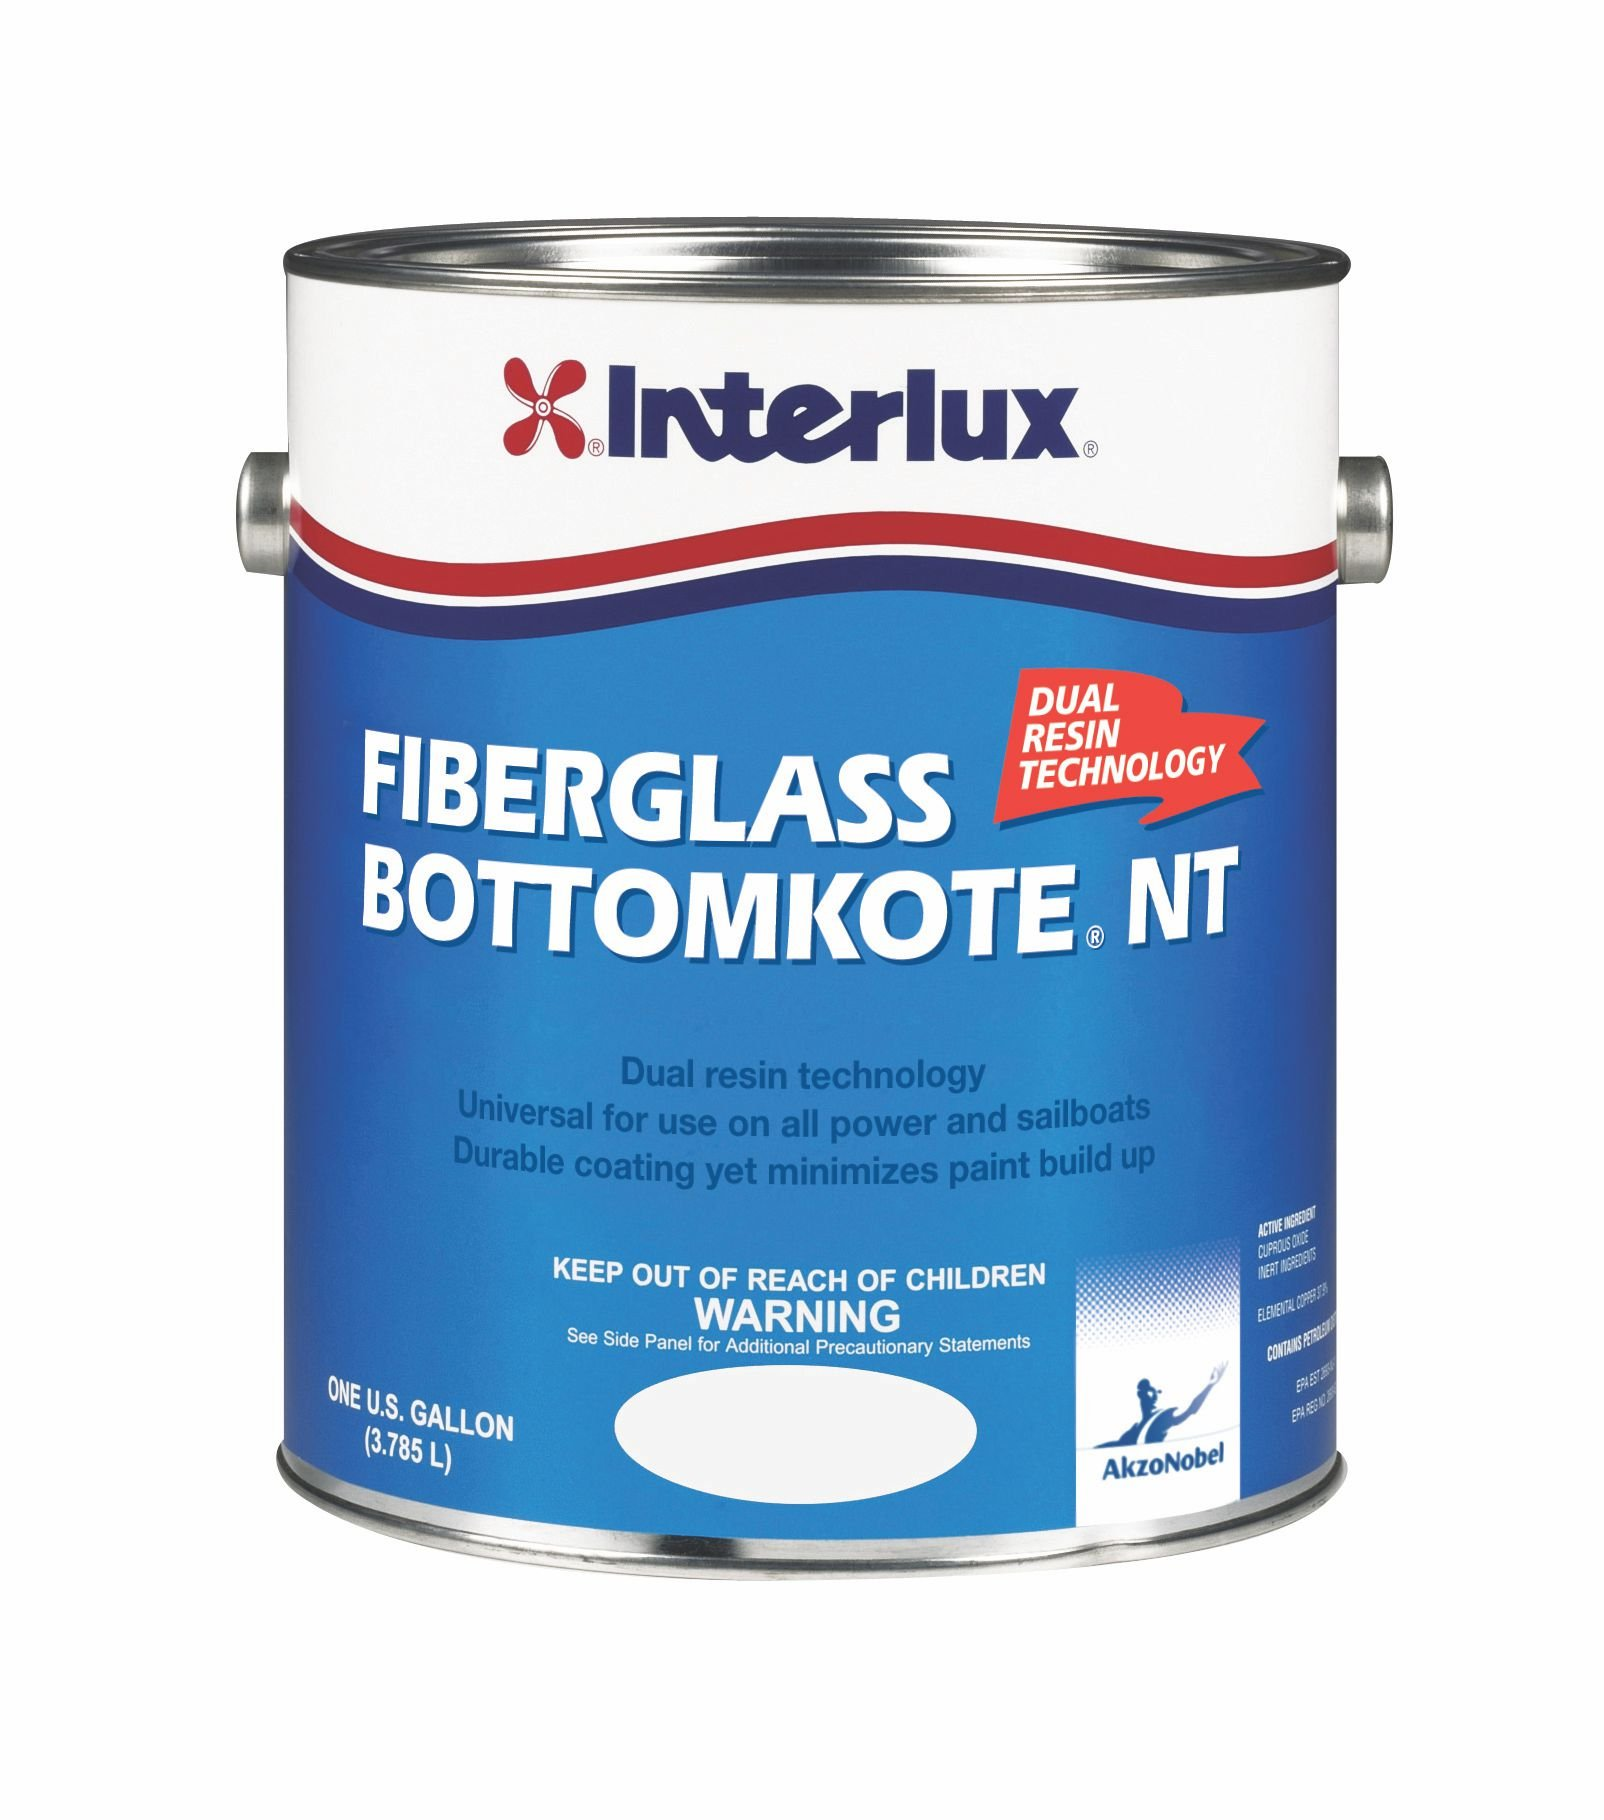 Interlux YBB379/1 Fiberglass Bottomkote NT Antifouling Paint - Black, Gallon